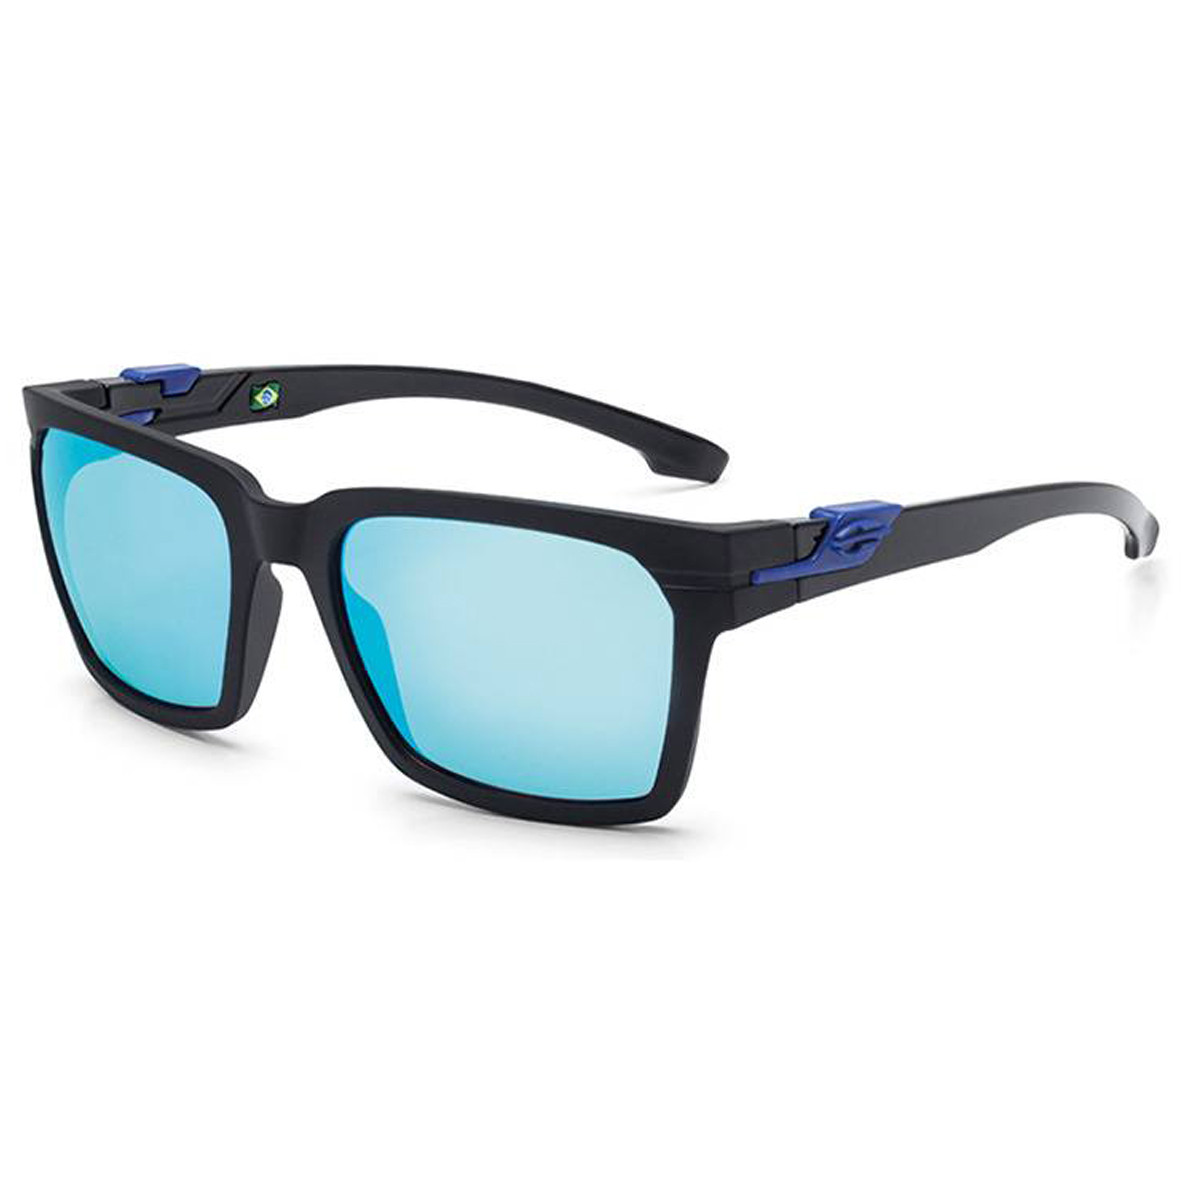 5379a9b336080 Óculos Mormaii Las Vegas Preto Fosco Lentes Cinza Azulado ref M0057AAU12